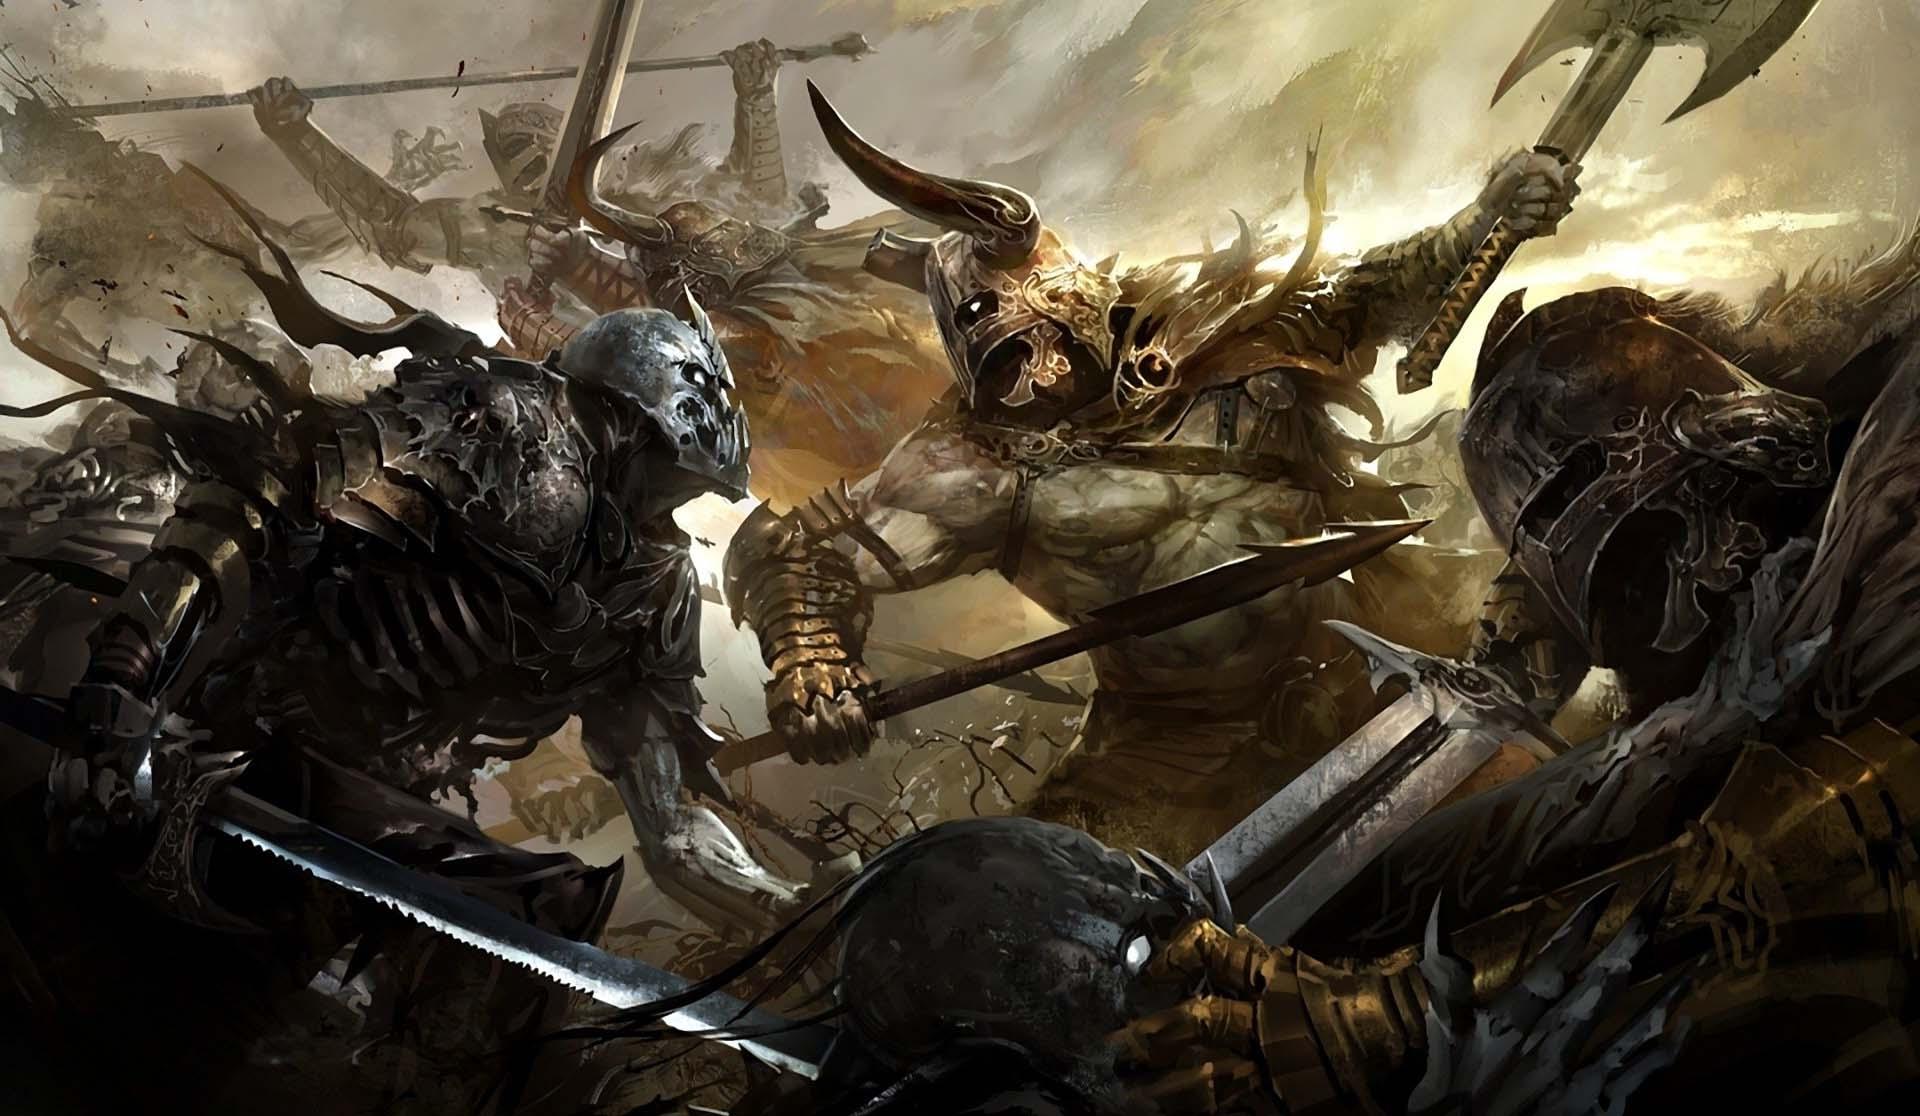 Wallpaper Knight War Battle Weapon Warrior Demon